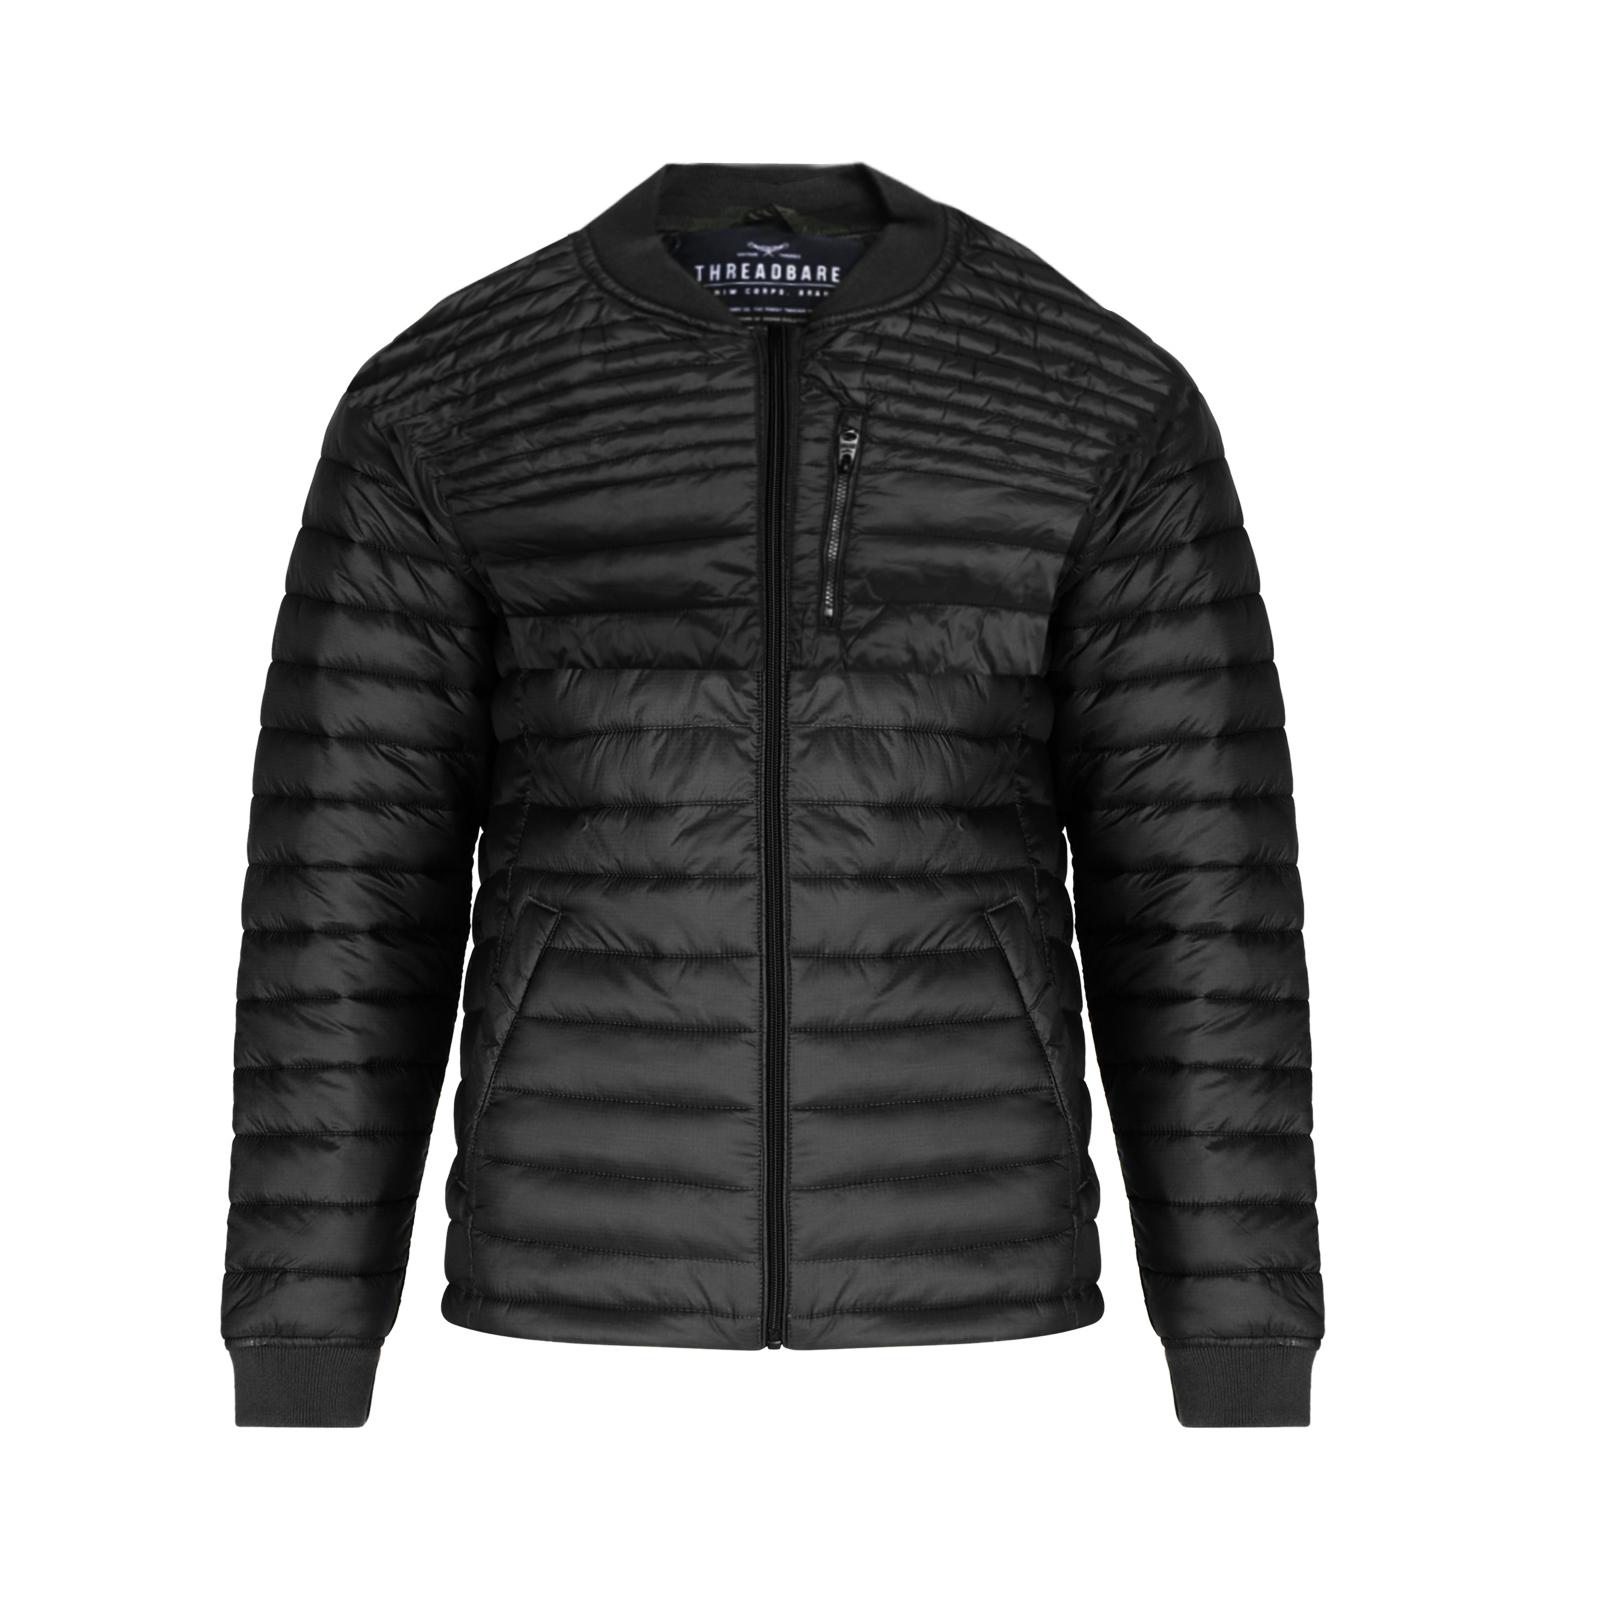 Threadbare-Mens-Naples-MA1-Bomber-Jacket-Designer-Quilted-Winter-Padded-Coat thumbnail 2